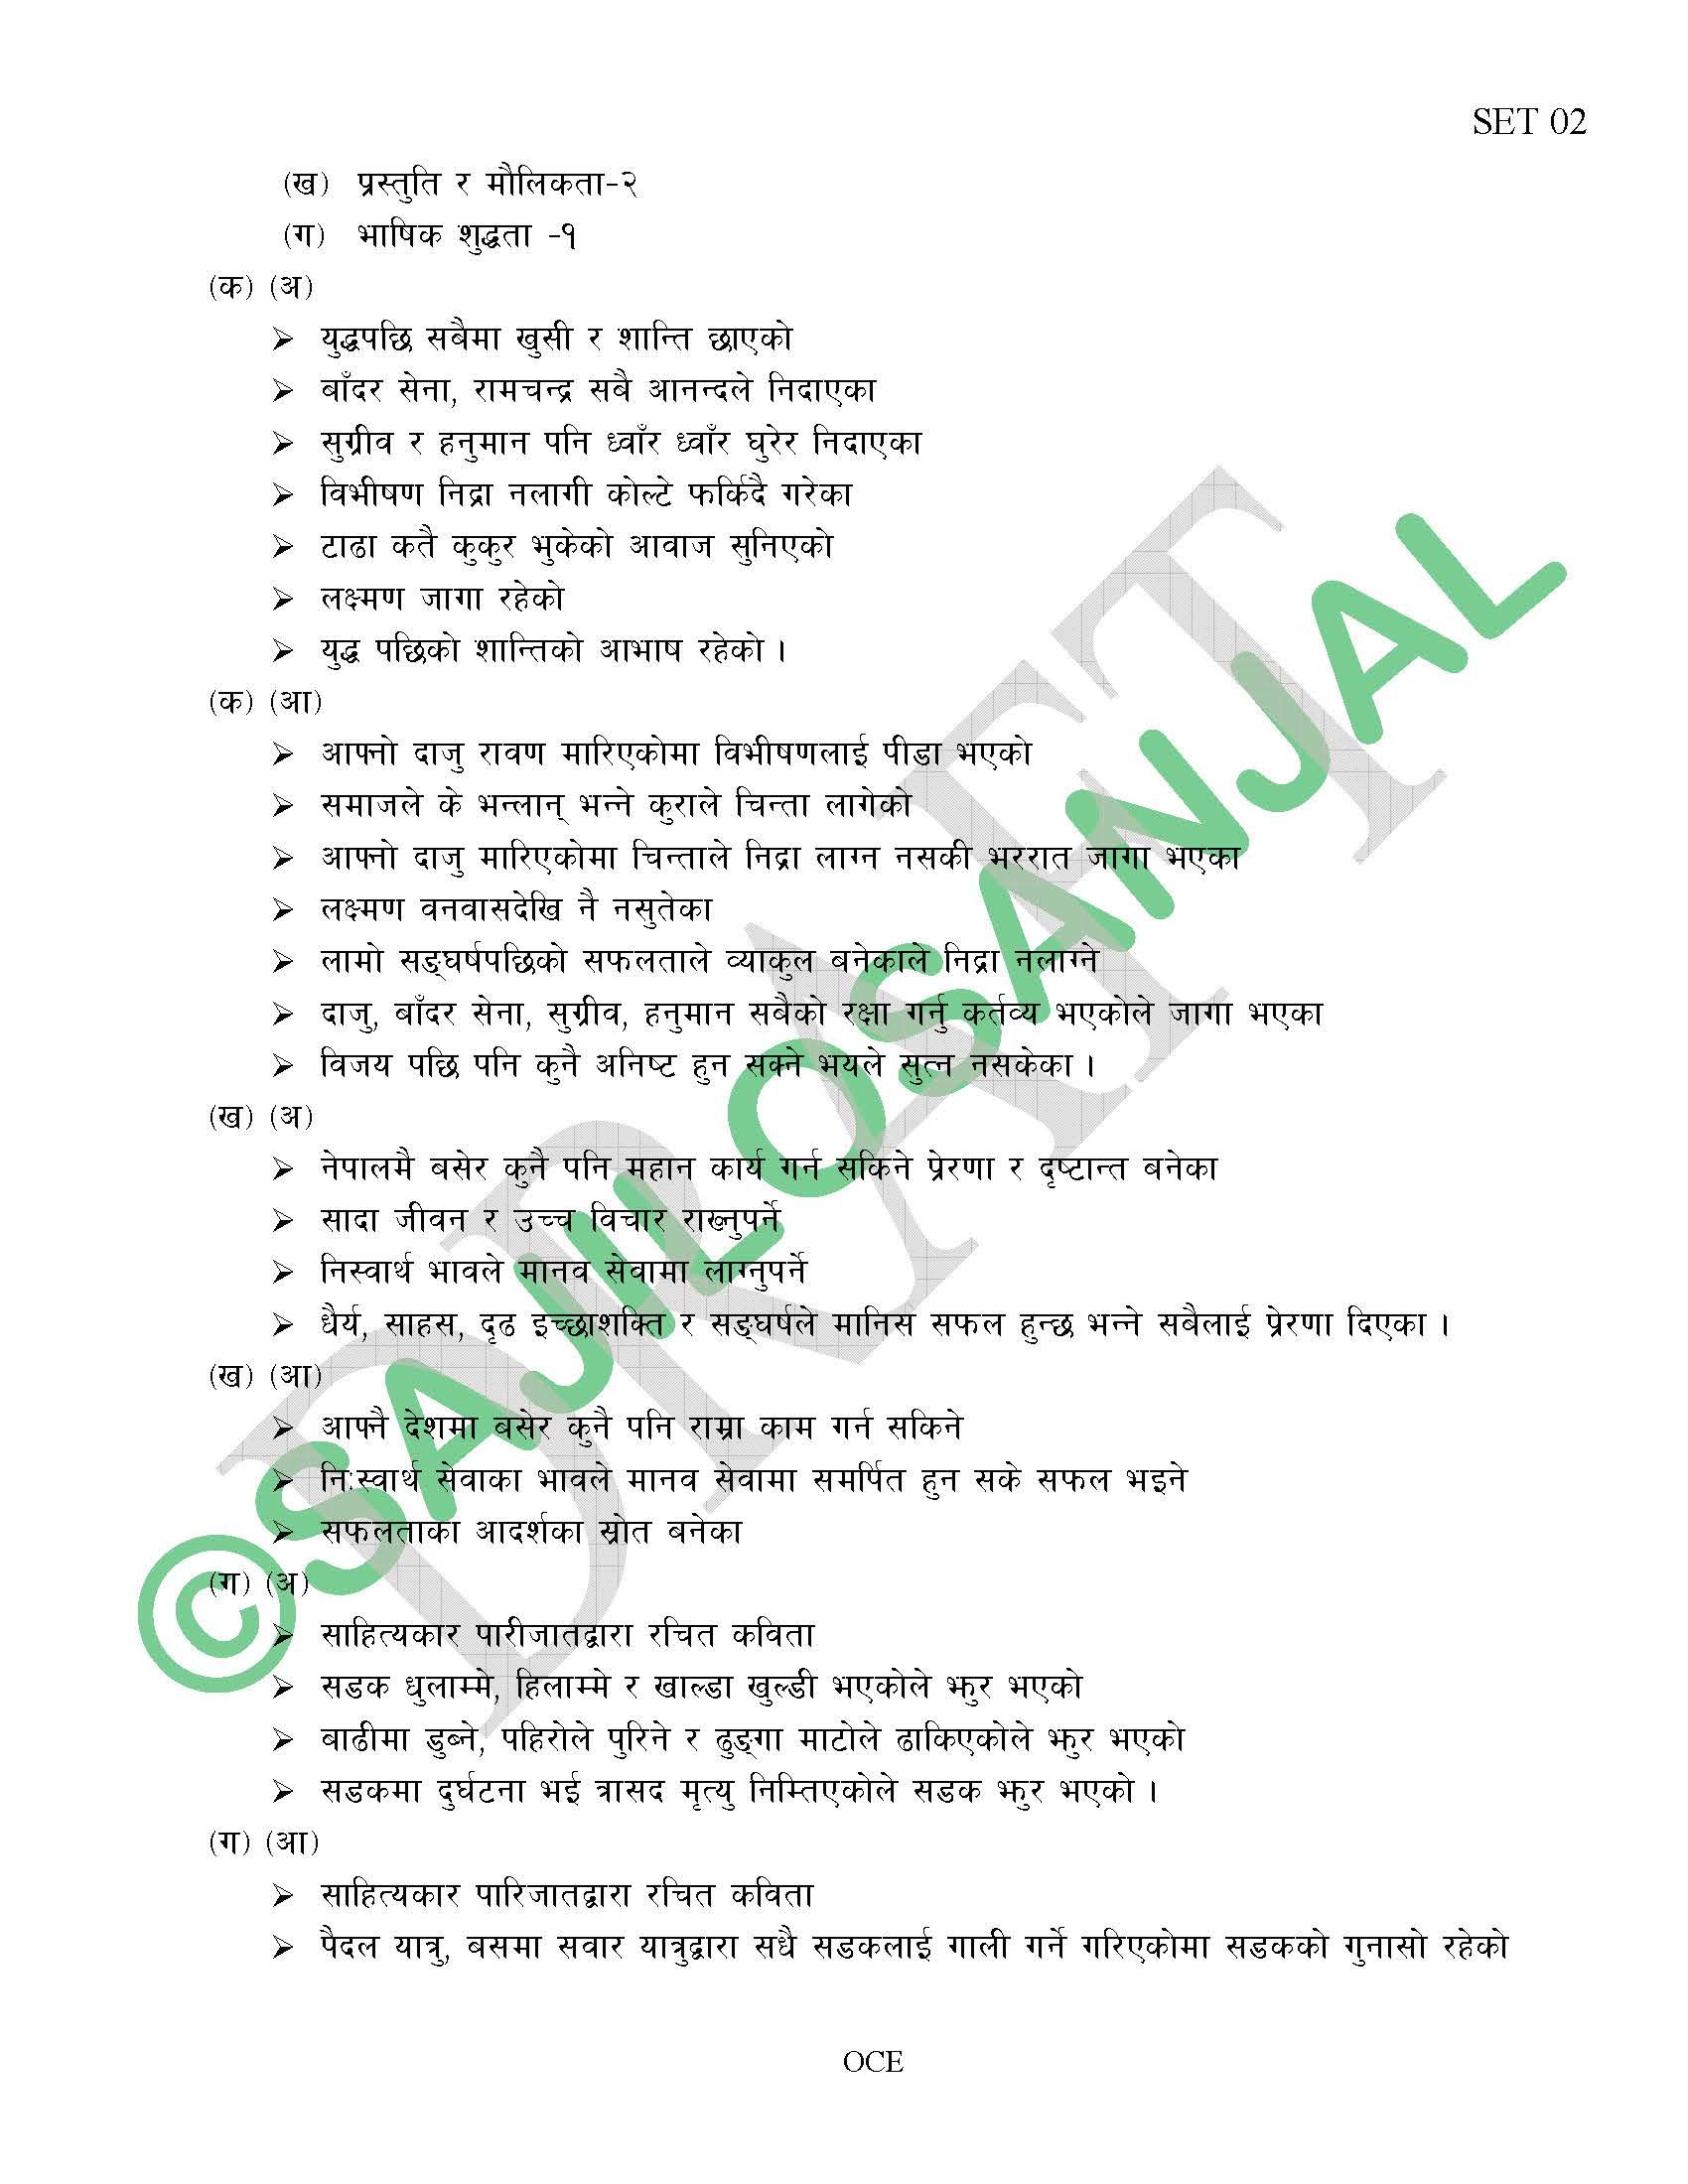 see model question 2074 Nepali,  slc model questions of Nepali with answers,  see Nepali model question 2074,  see Nepali model question,  see questions Nepali,    see model question 2075 Nepali,  see model question 2074 Nepali,  see model question 2074 pdf,  see model questions of compulsory Nepali,  see compulsory Nepali,  see model question 2074 Nepali,  see questions of Nepali, see Nepali questions,  see model questions Nepali,  see questions 2074 Nepali,  see model questions Nepali 2074,  see model questions for Nepali,  see Nepali questions,  see questions Nepali,  see Nepali questions,  see practice questions Nepali,  see model questions Nepali,  see model questions of Nepali,  see questions of Nepali,  see model questions of Nepali with answers,  see Nepali questions,  see model questions Nepali,      see model questions 2074,  see questions 2075,  see questions model ,,  model question 2074,  see questions 2074,  see all questions, see draft questions,  www.see questions.com,  see model questions computer,  see draft questions 2074,  see model questions for 2074,  see entrance questions,  questions for see,  see 2074 questions and answers,  see sample questions see set questions,  see questions paper 2074,  see questions paper,  see practice questions,  see model questions 2074 pdf,  see practice questions 2075,   see model questions 2074 download,    see model question 2075 Nepali,  see model question 2074 Nepali,  see model question 2074 pdf,  see model questions of compulsory Nepali,  see compulsory Nepali ,  see model question 2074 Nepali,  see questions of Nepali,  see Nepali questions, see model questions Nepali,  see questions 2074 Nepali,  see model questions Nepali 2074,  see model questions for Nepali, see Nepali questions,  see questions Nepali,  see Nepali questions,  see practice questions Nepali,  see model questions Nepali,  see model questions of Nepali, s ee questions of Nepali,  see model questions of Nepali with answers,  see Nepali quest